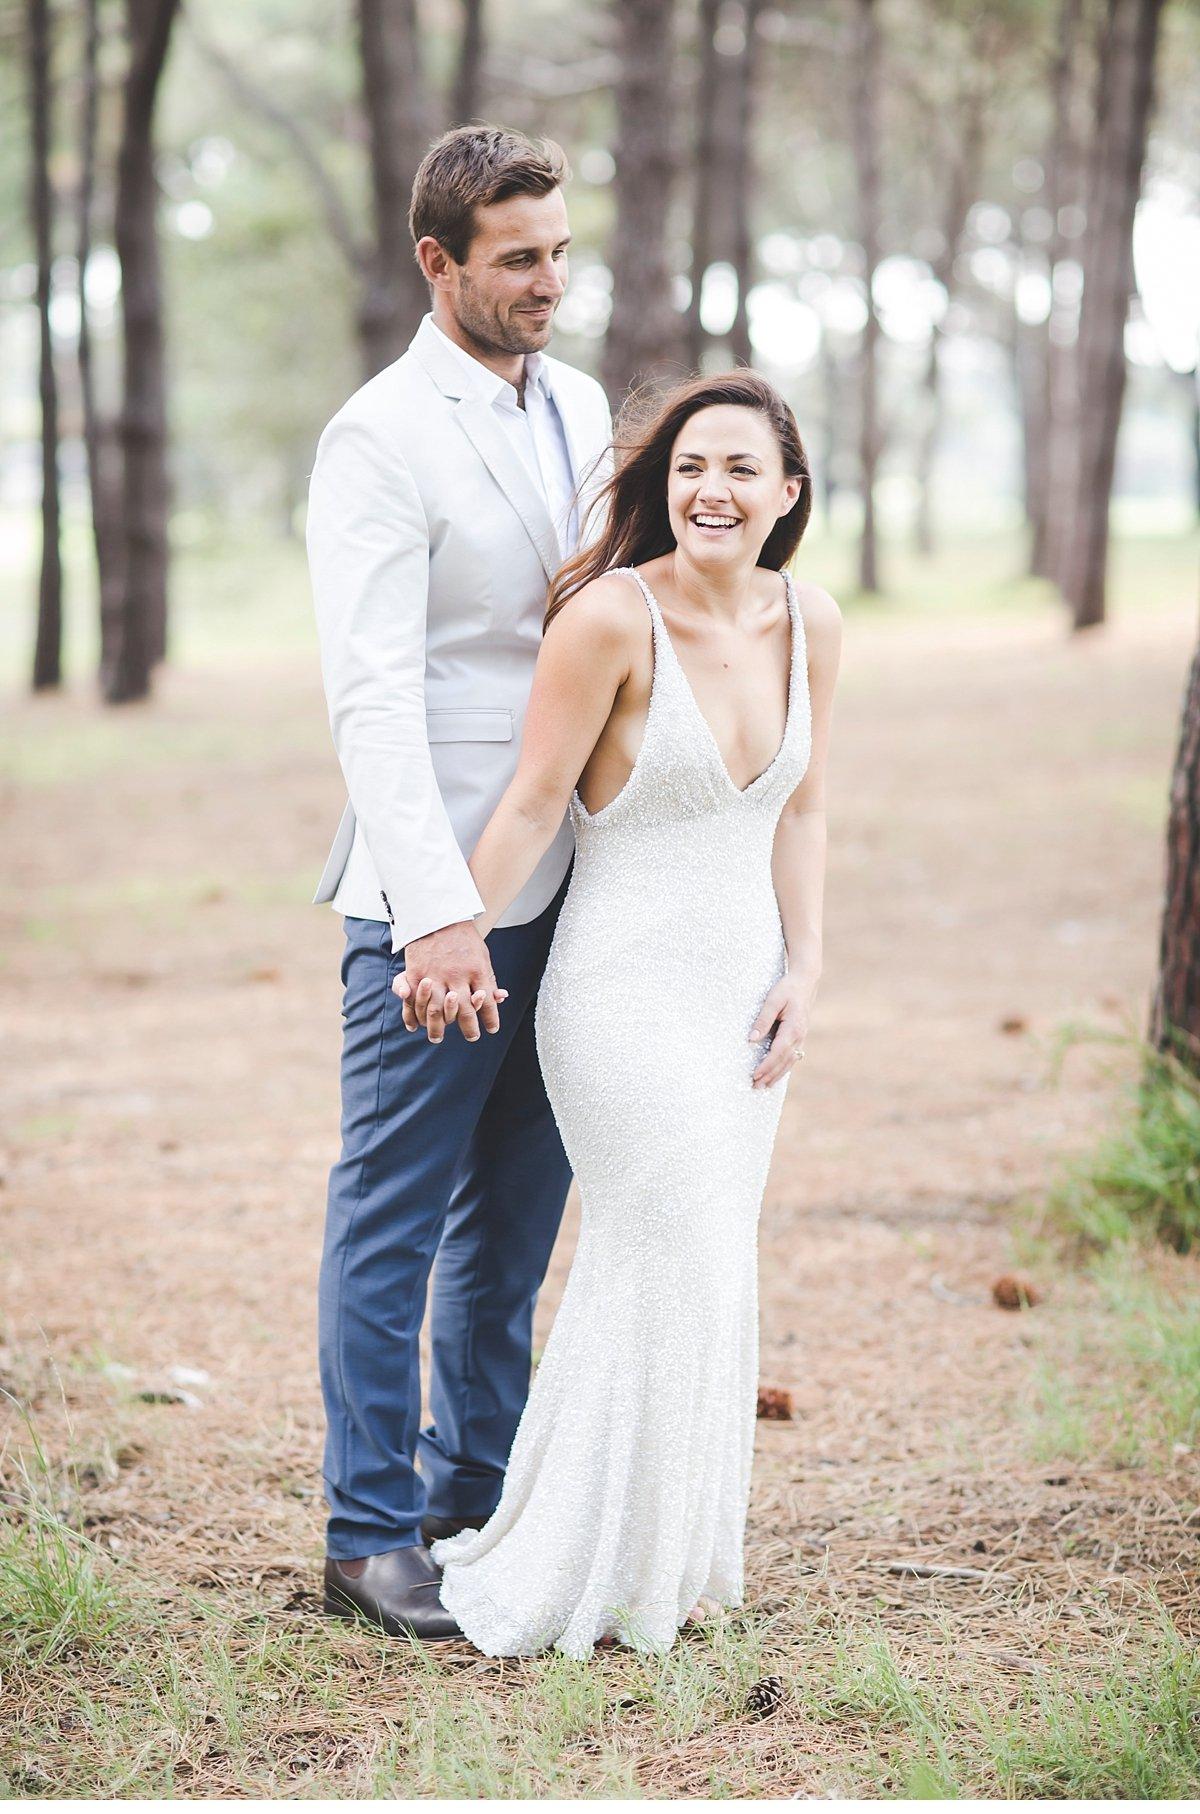 Wagga Wagga Wedding Photographer Sydney Wedding Bondi Beach Australian Wedding Photographer_0444